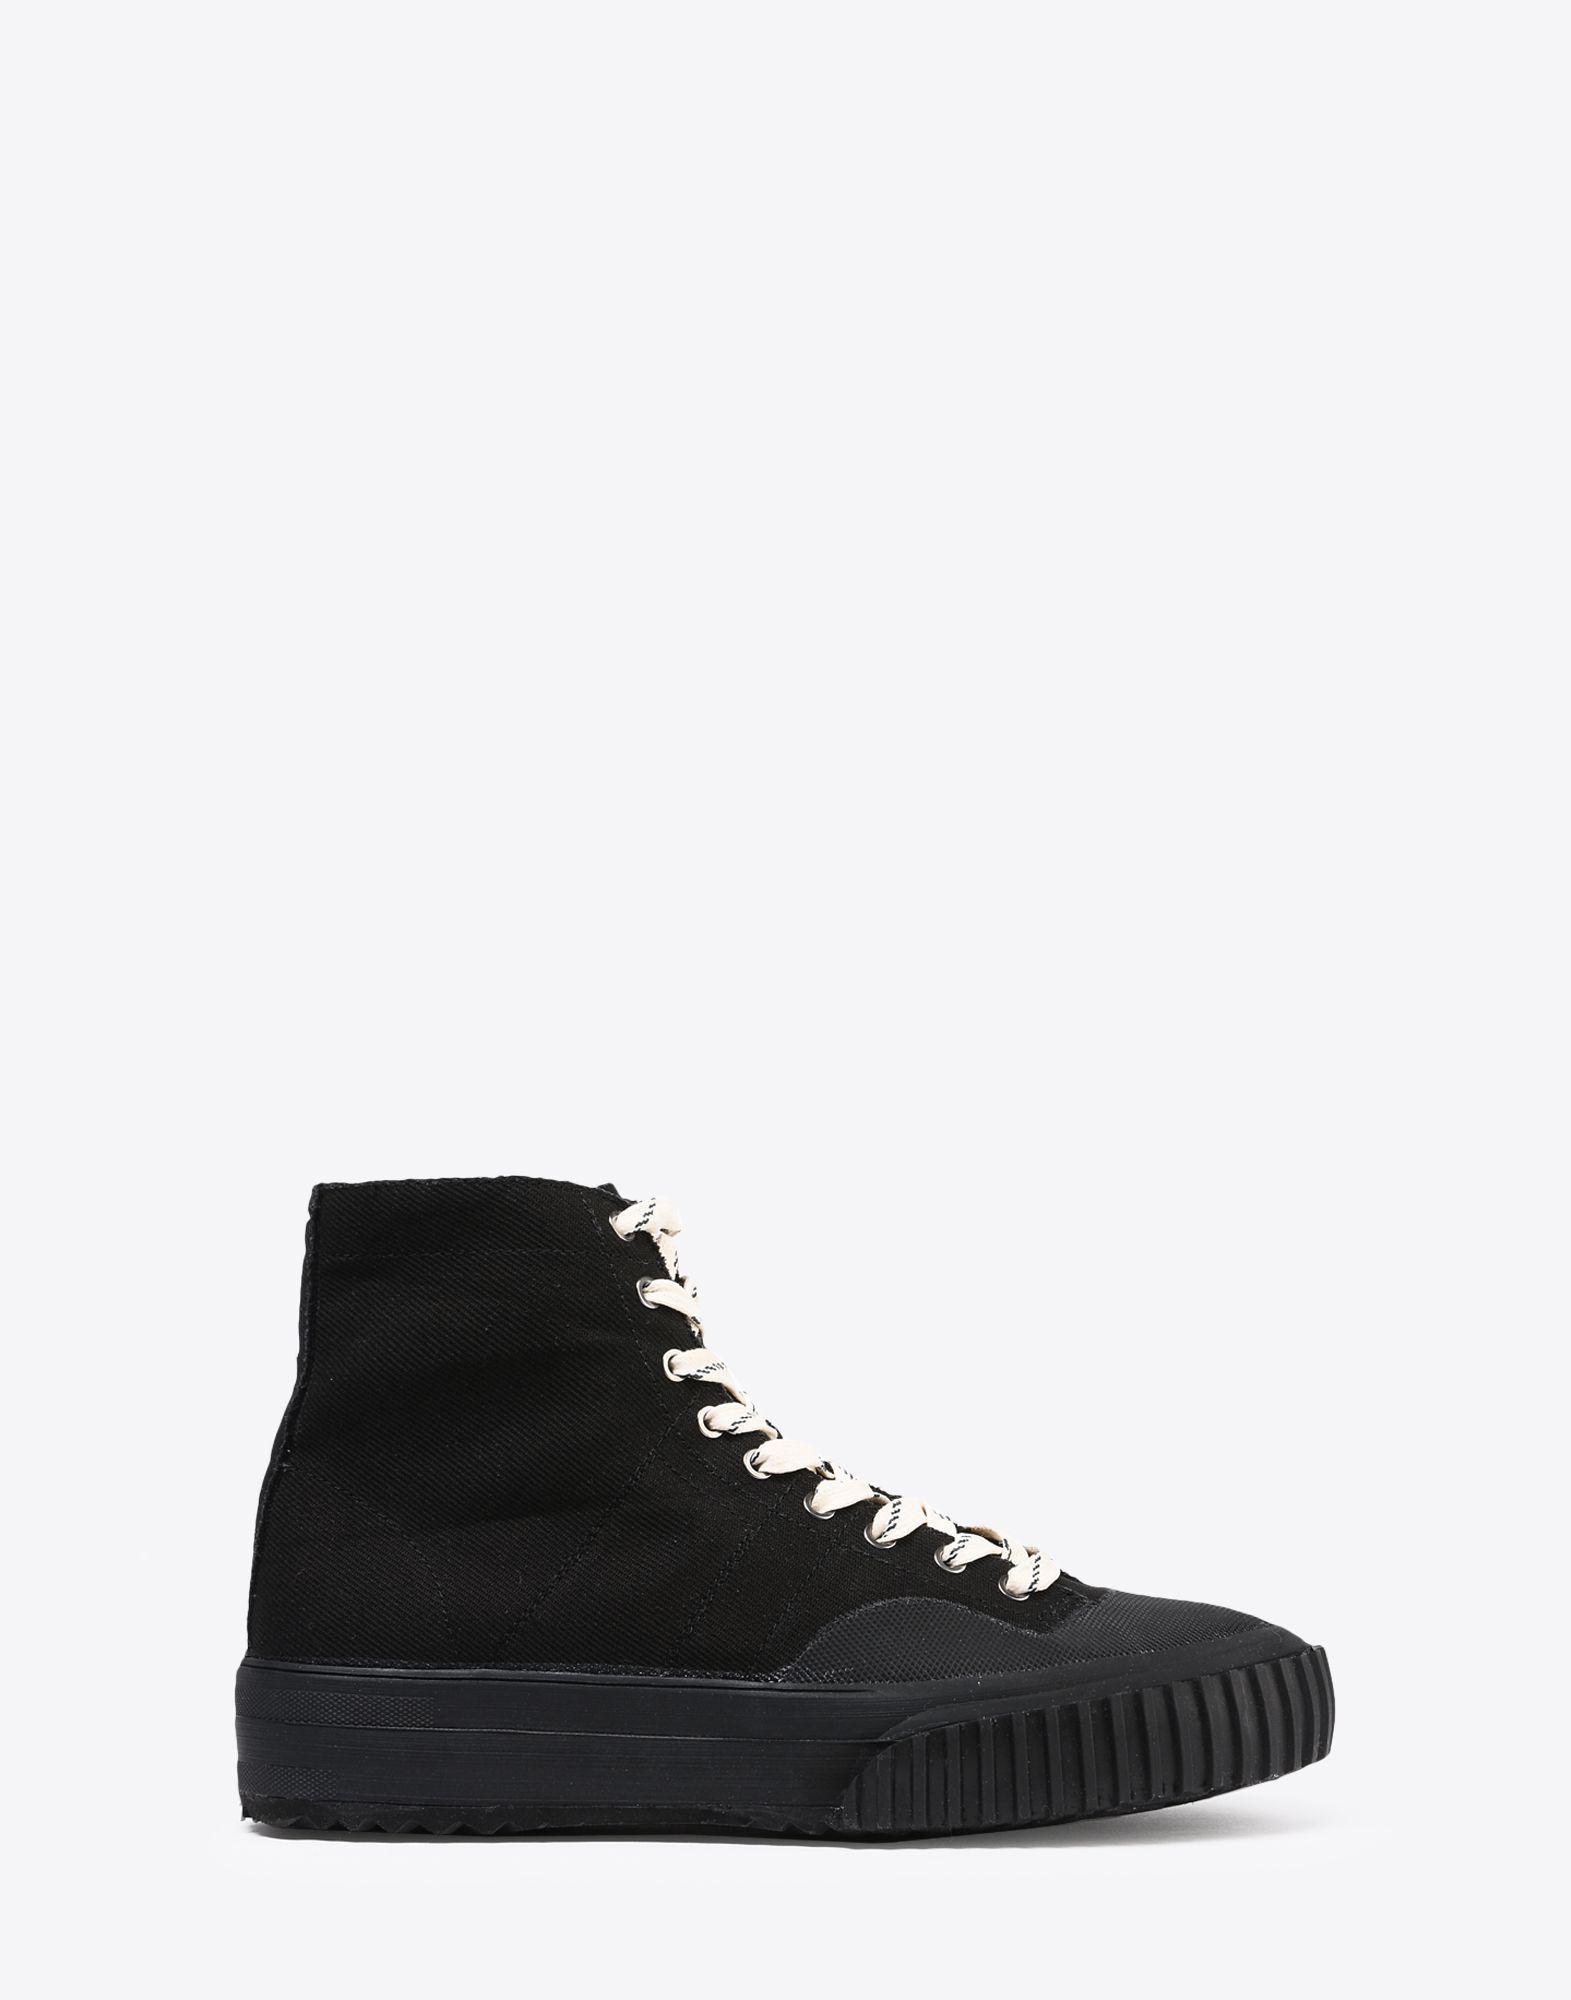 Canvas And Rubber Sneakers - BlackMaison Martin Margiela 8mgXk7I5Eg